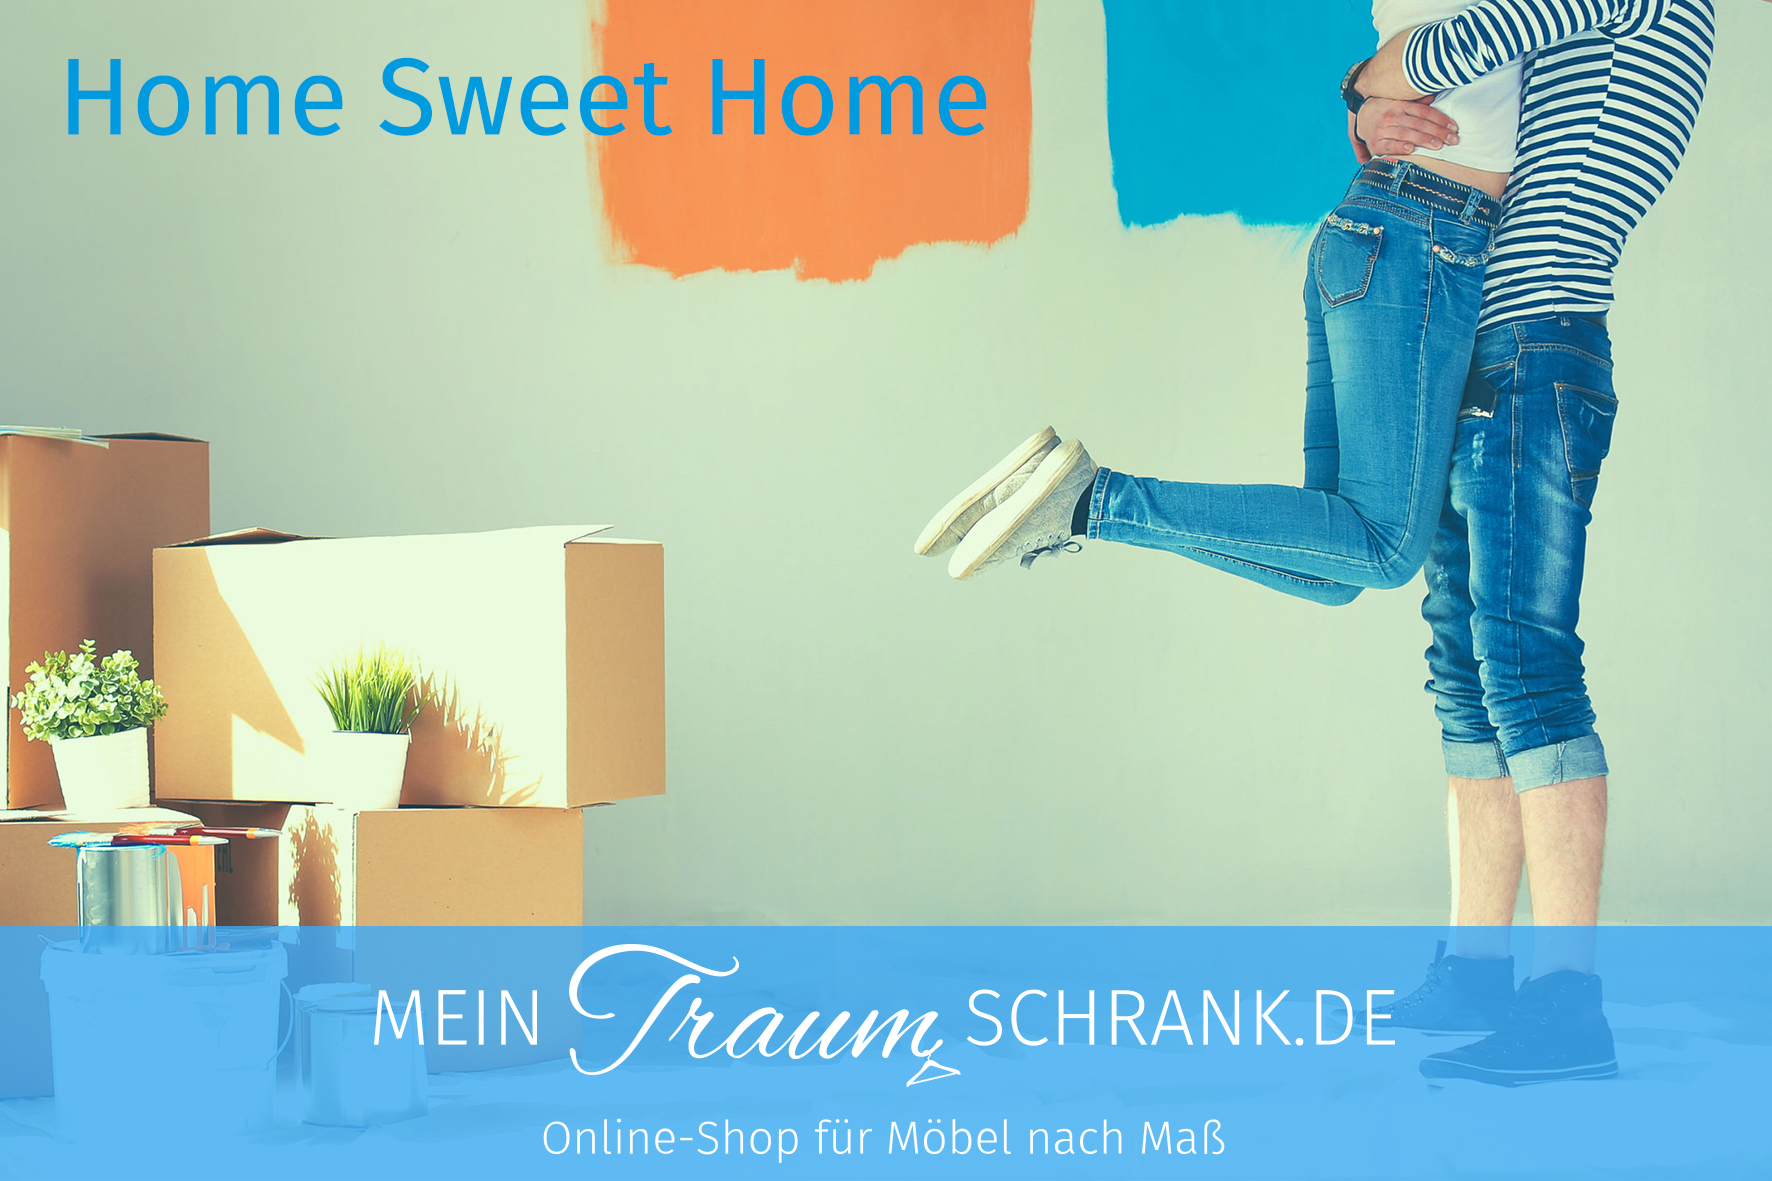 Motiv - Einzug / Home Sweet Home